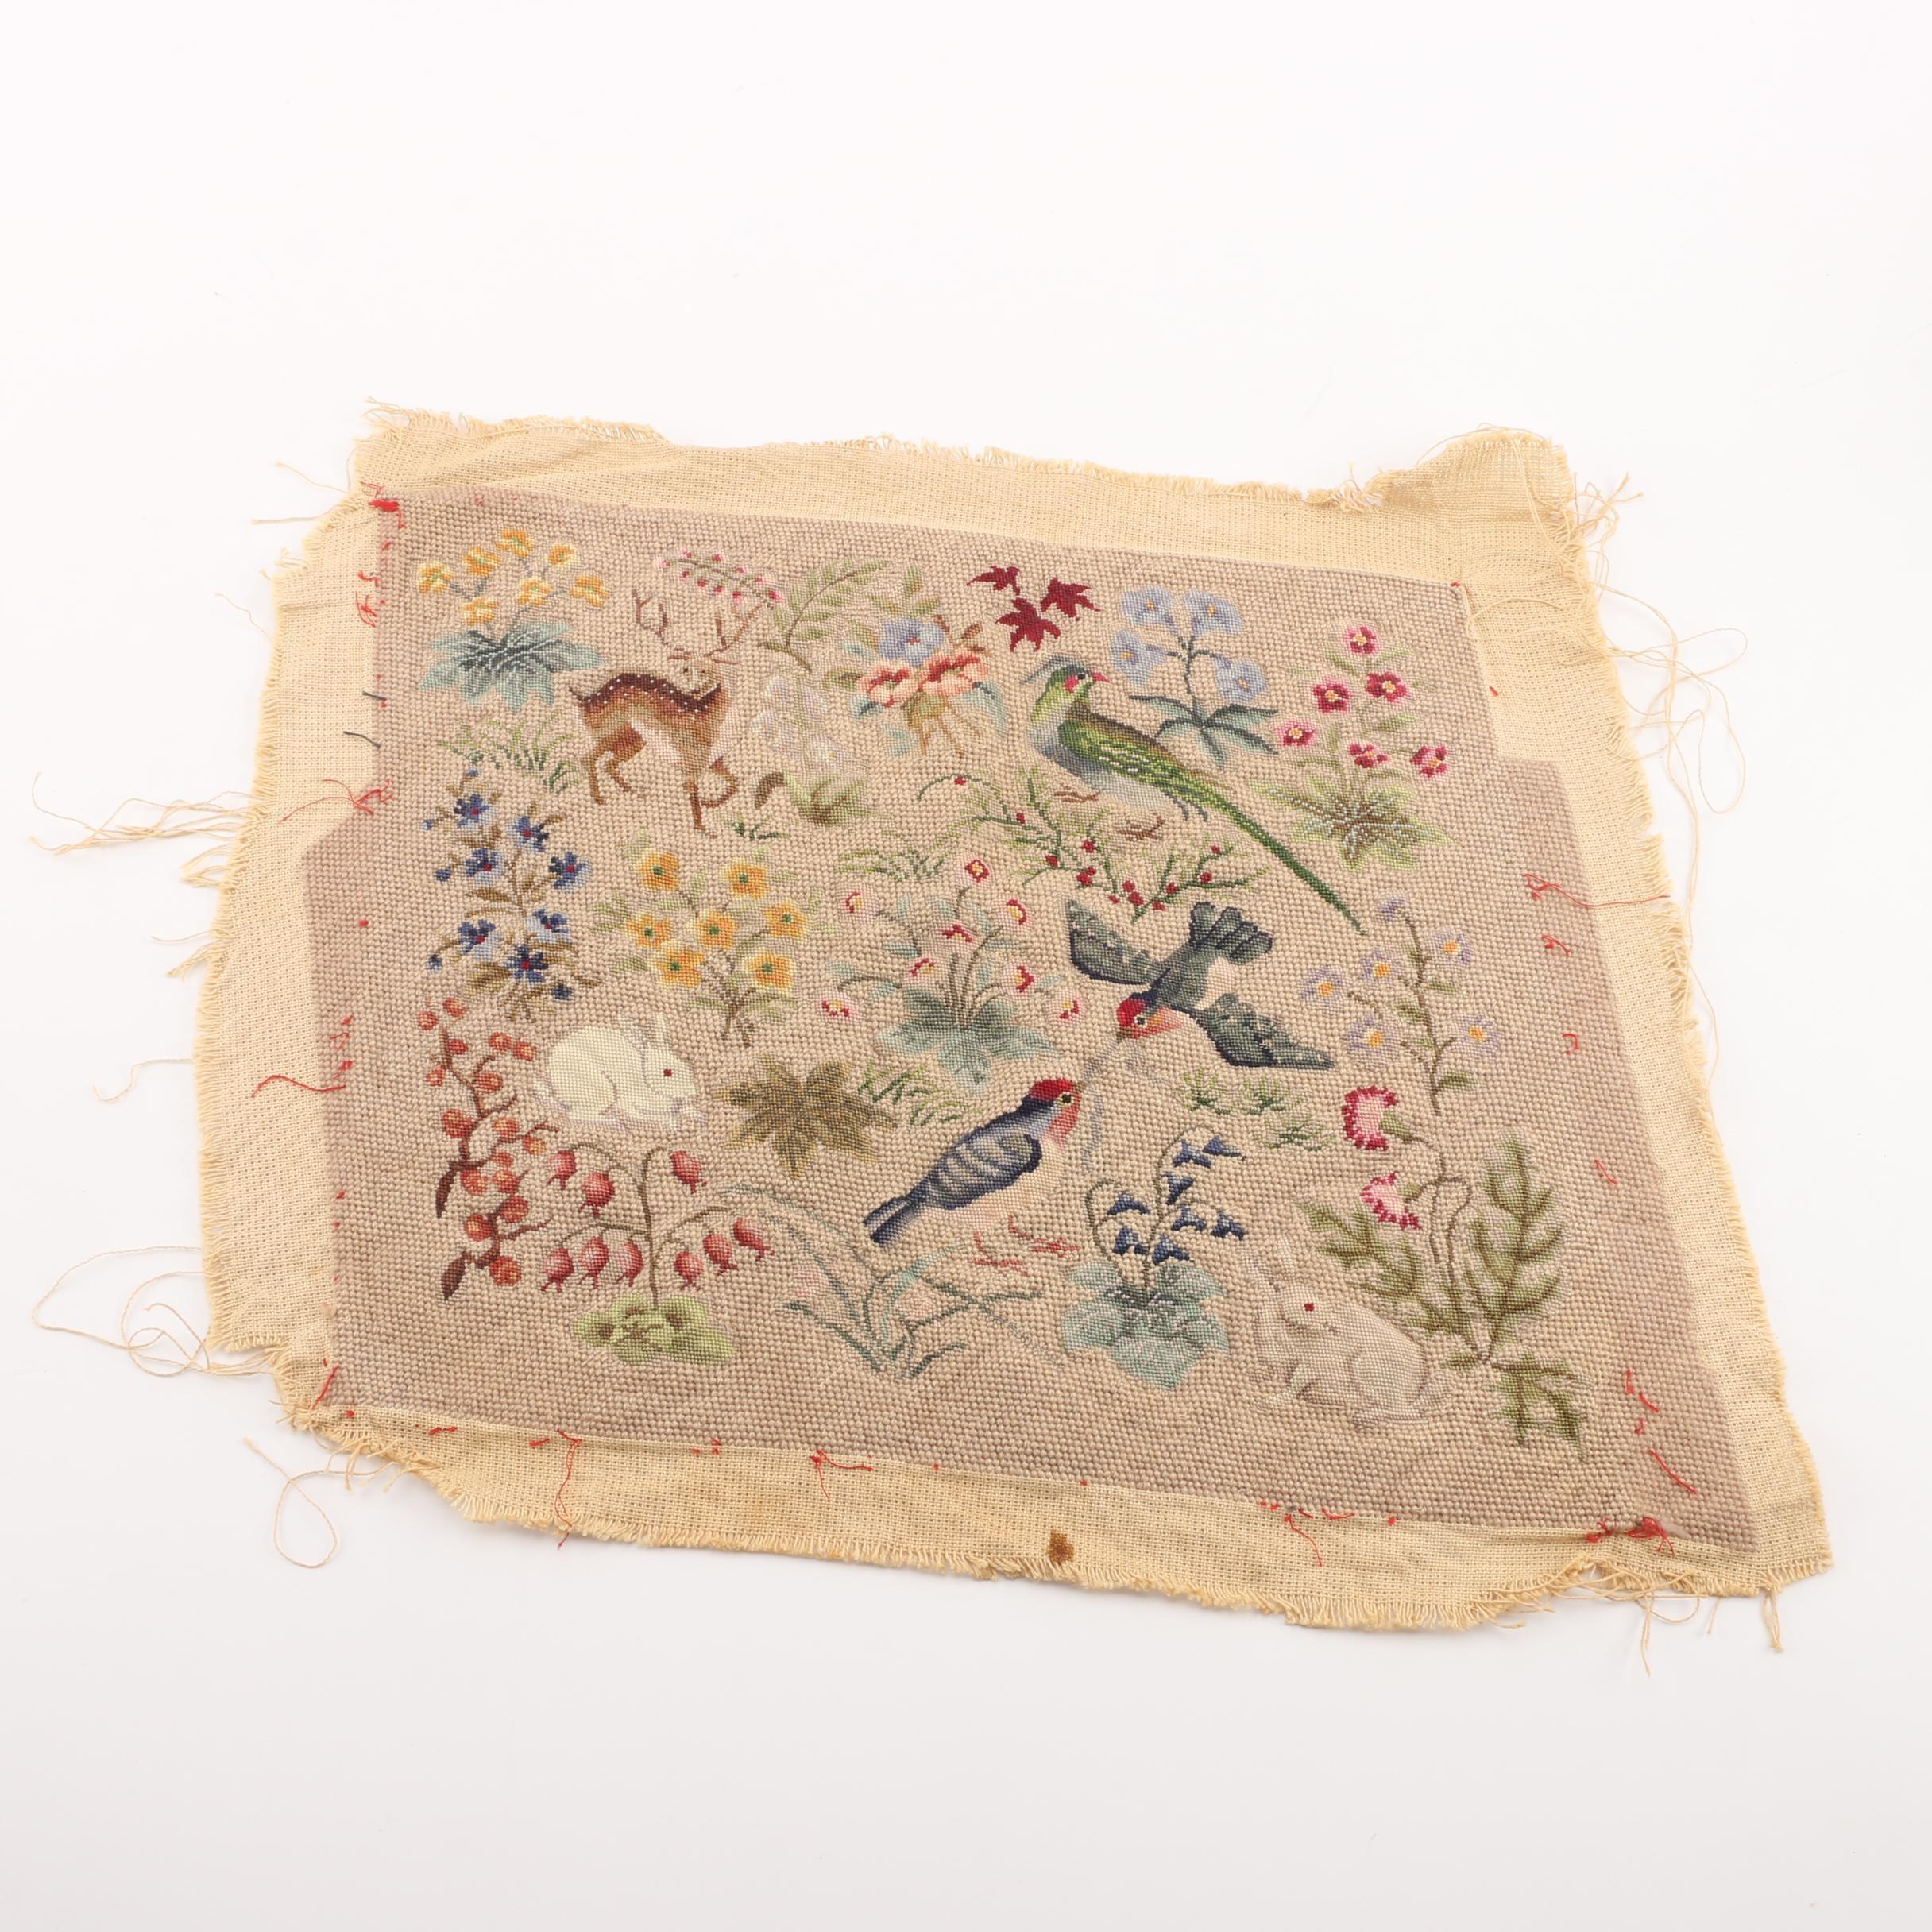 Vintage Needlepoint Woodland Tapestry